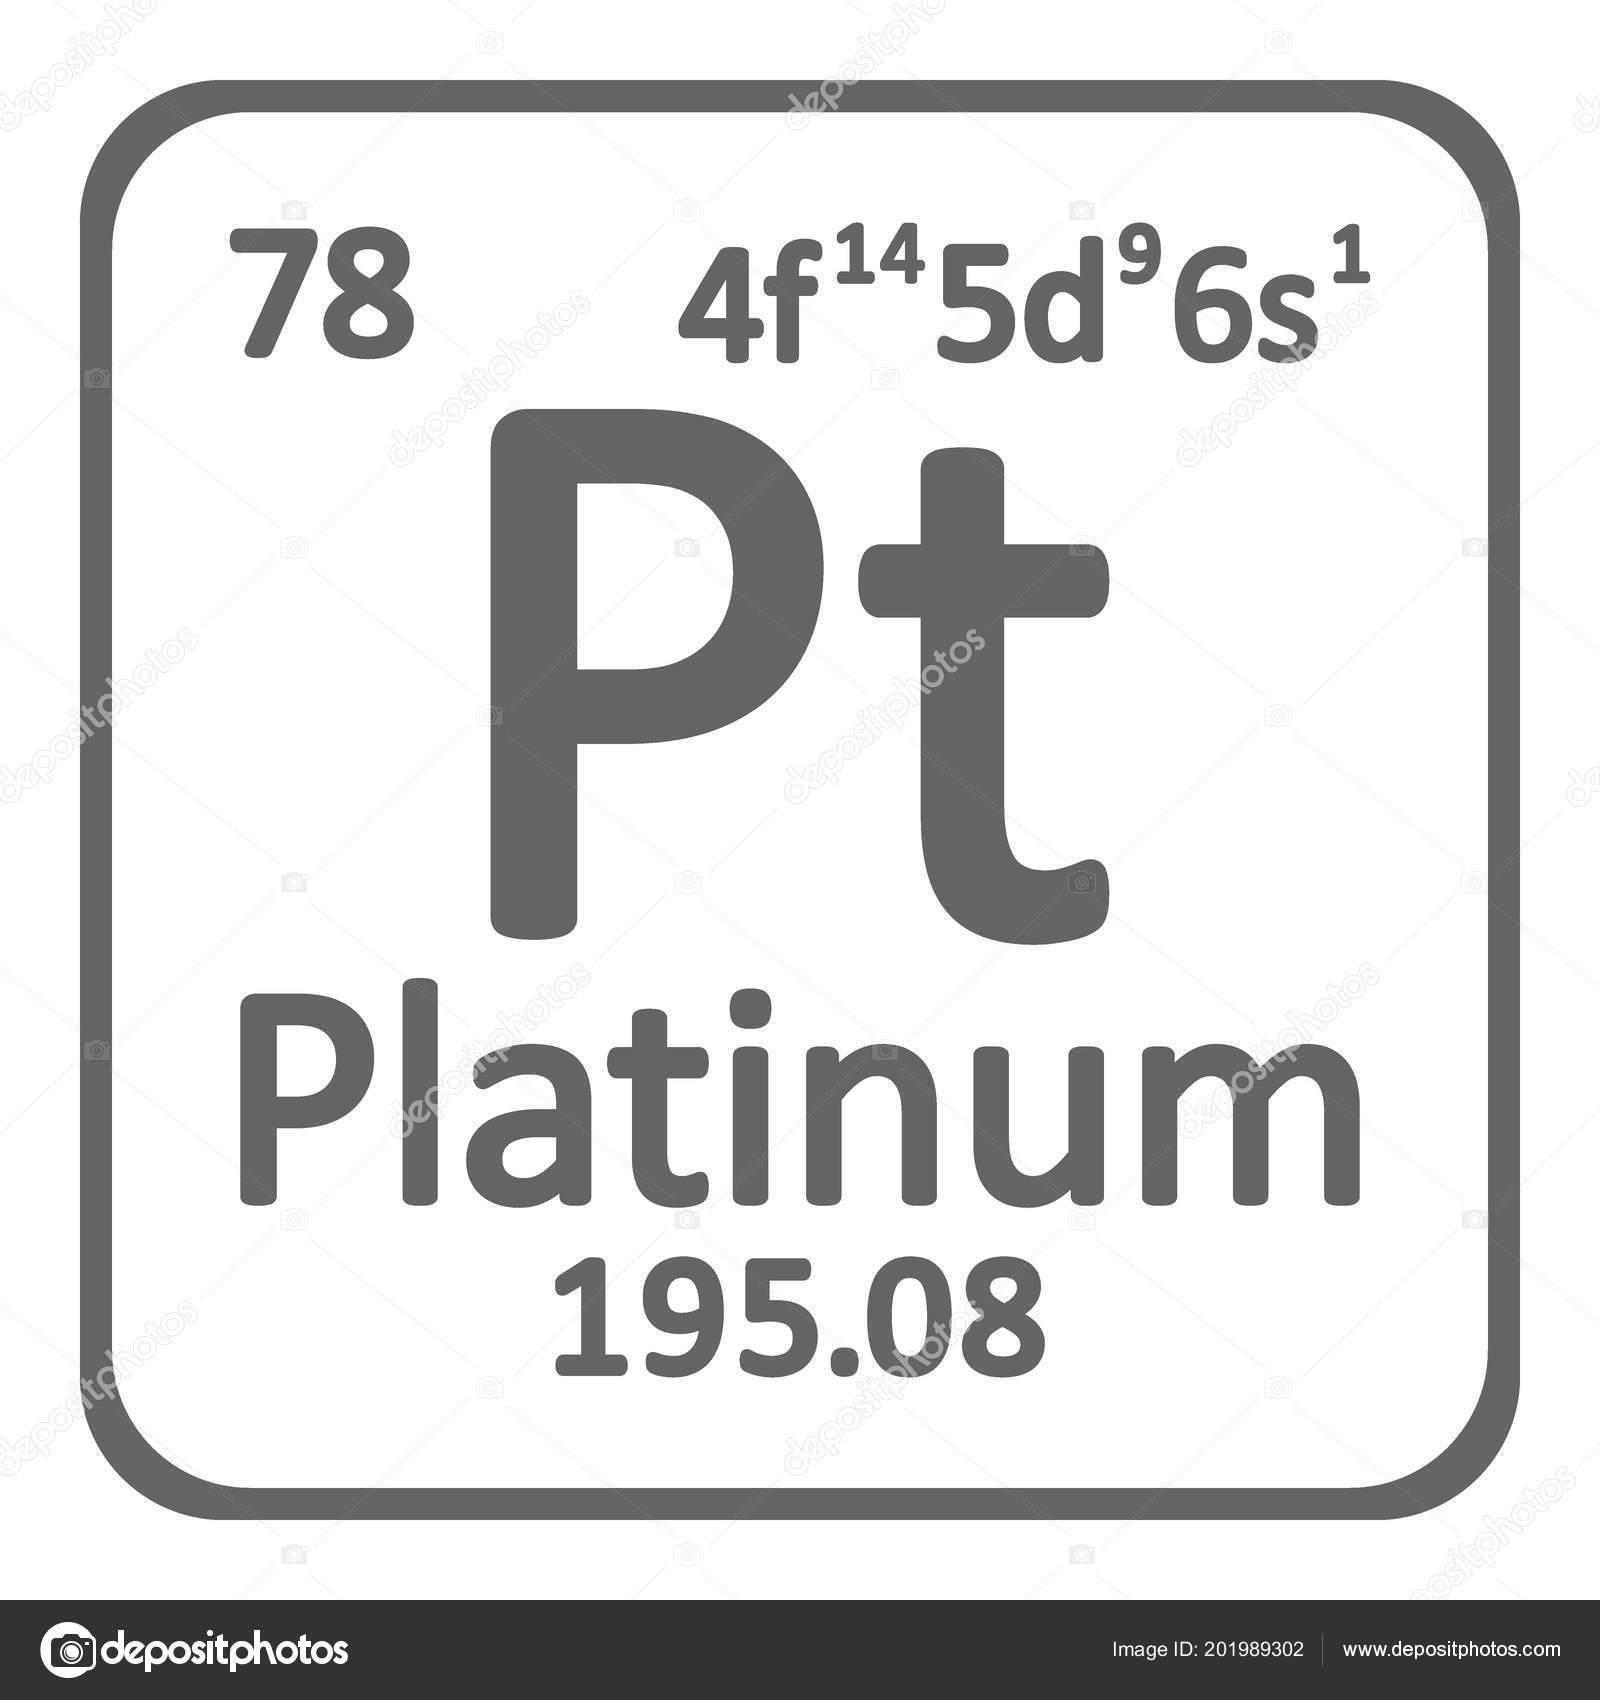 Tabla periodica elemento platino icono fondo blanco ilustracin tabla periodica elemento platino icono fondo blanco ilustracin vector archivo imgenes vectoriales urtaz Image collections